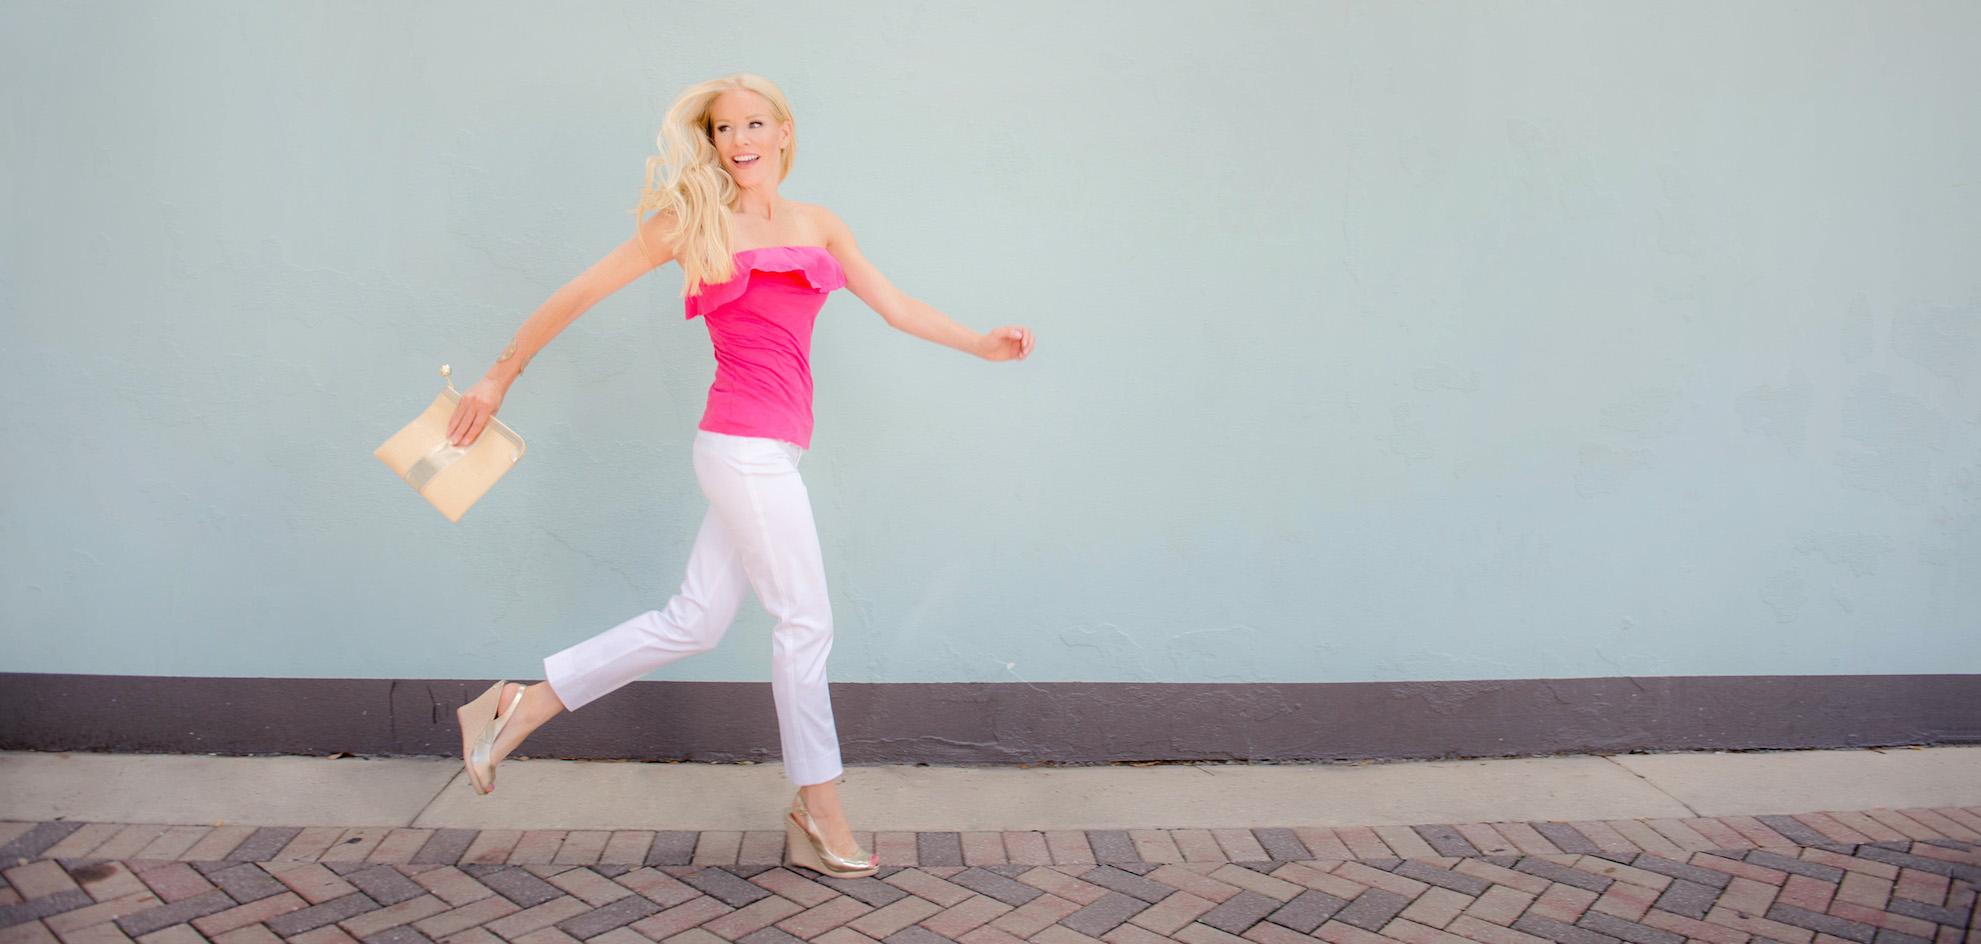 fitzness-pink-running